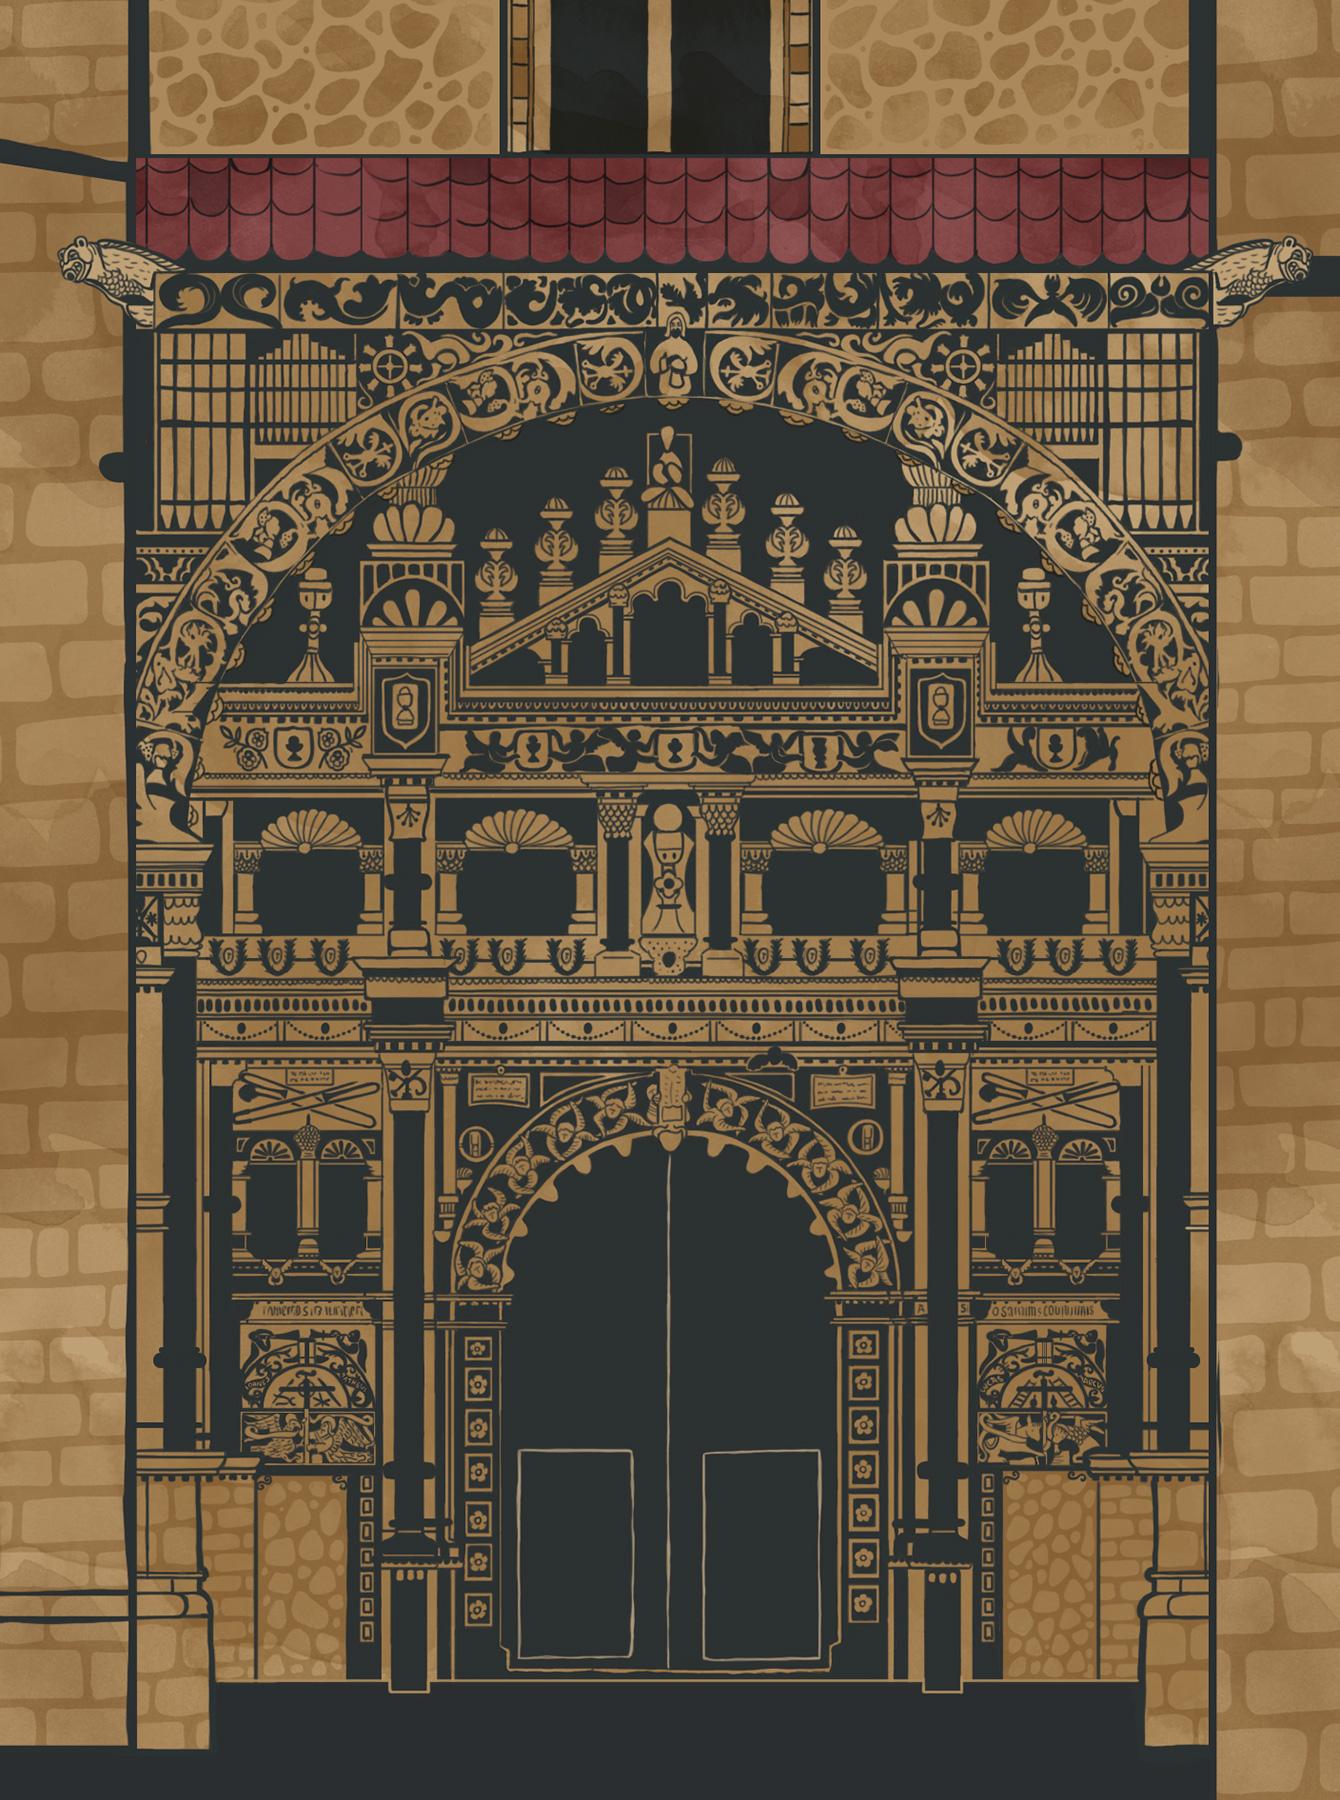 Detalle de la puerta de la Colegiata de Torrijos